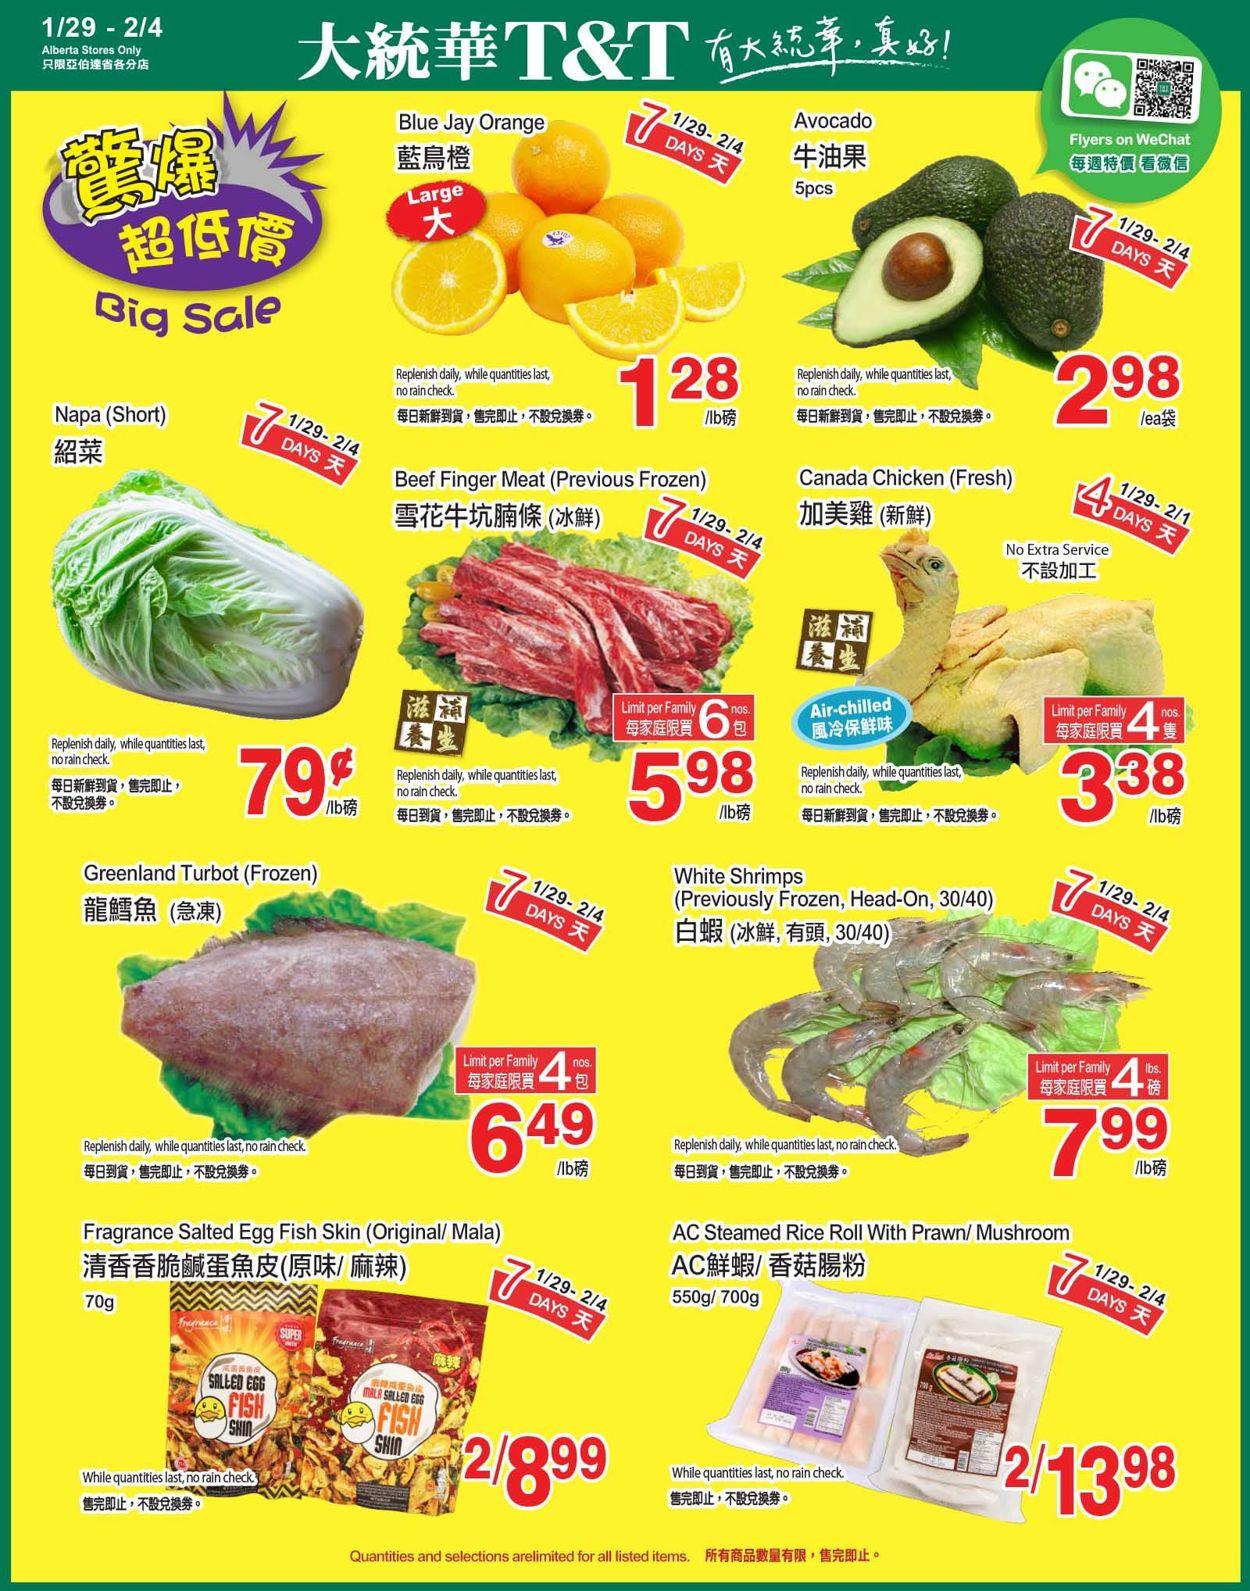 T&T Supermarket - Alberta Flyer - 01/29-02/04/2021